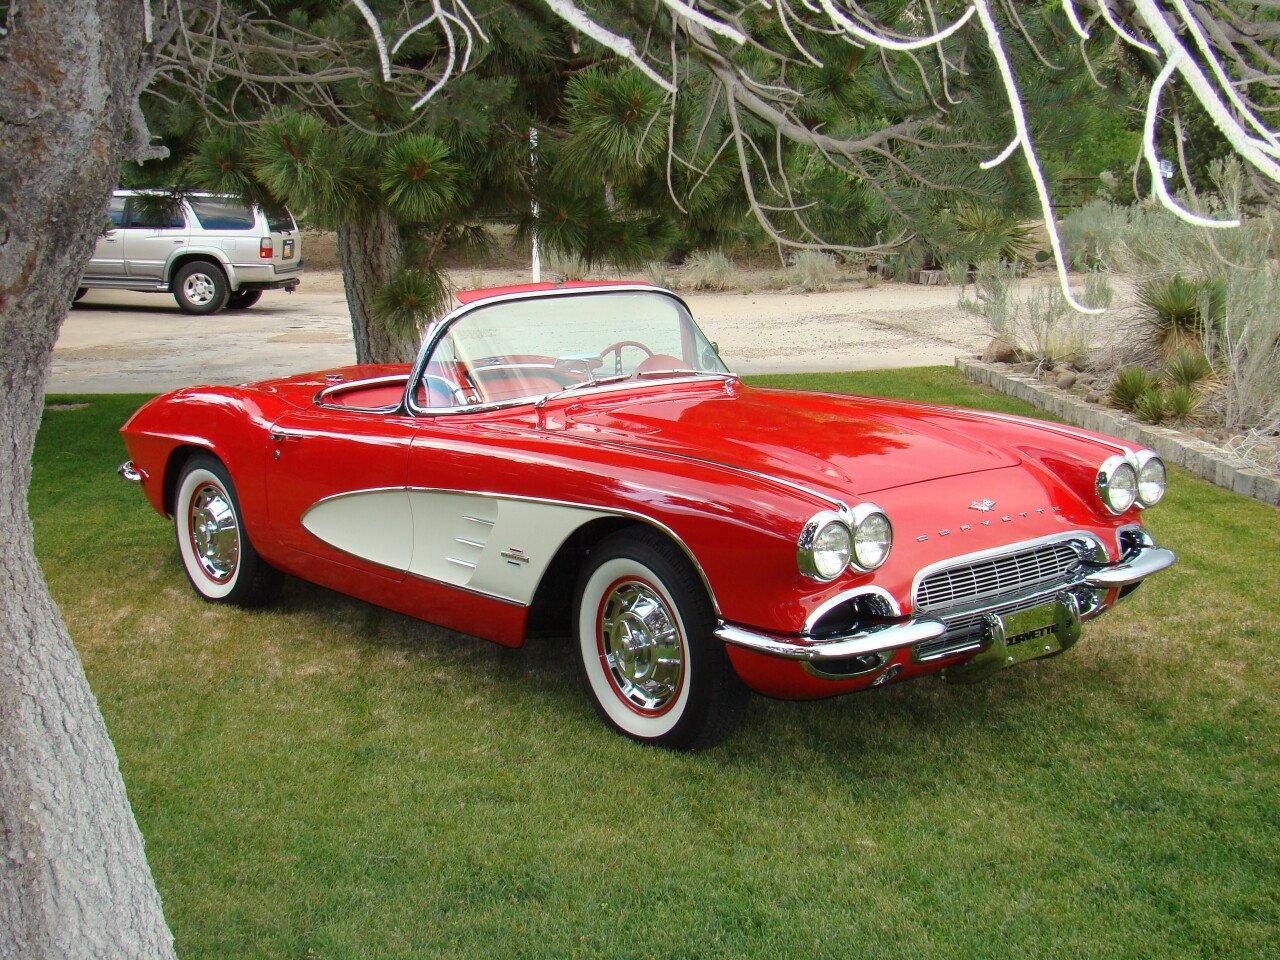 Classic Cars For Sale Auto Trader Com: 1961 Chevrolet Corvette Convertible For Sale Near